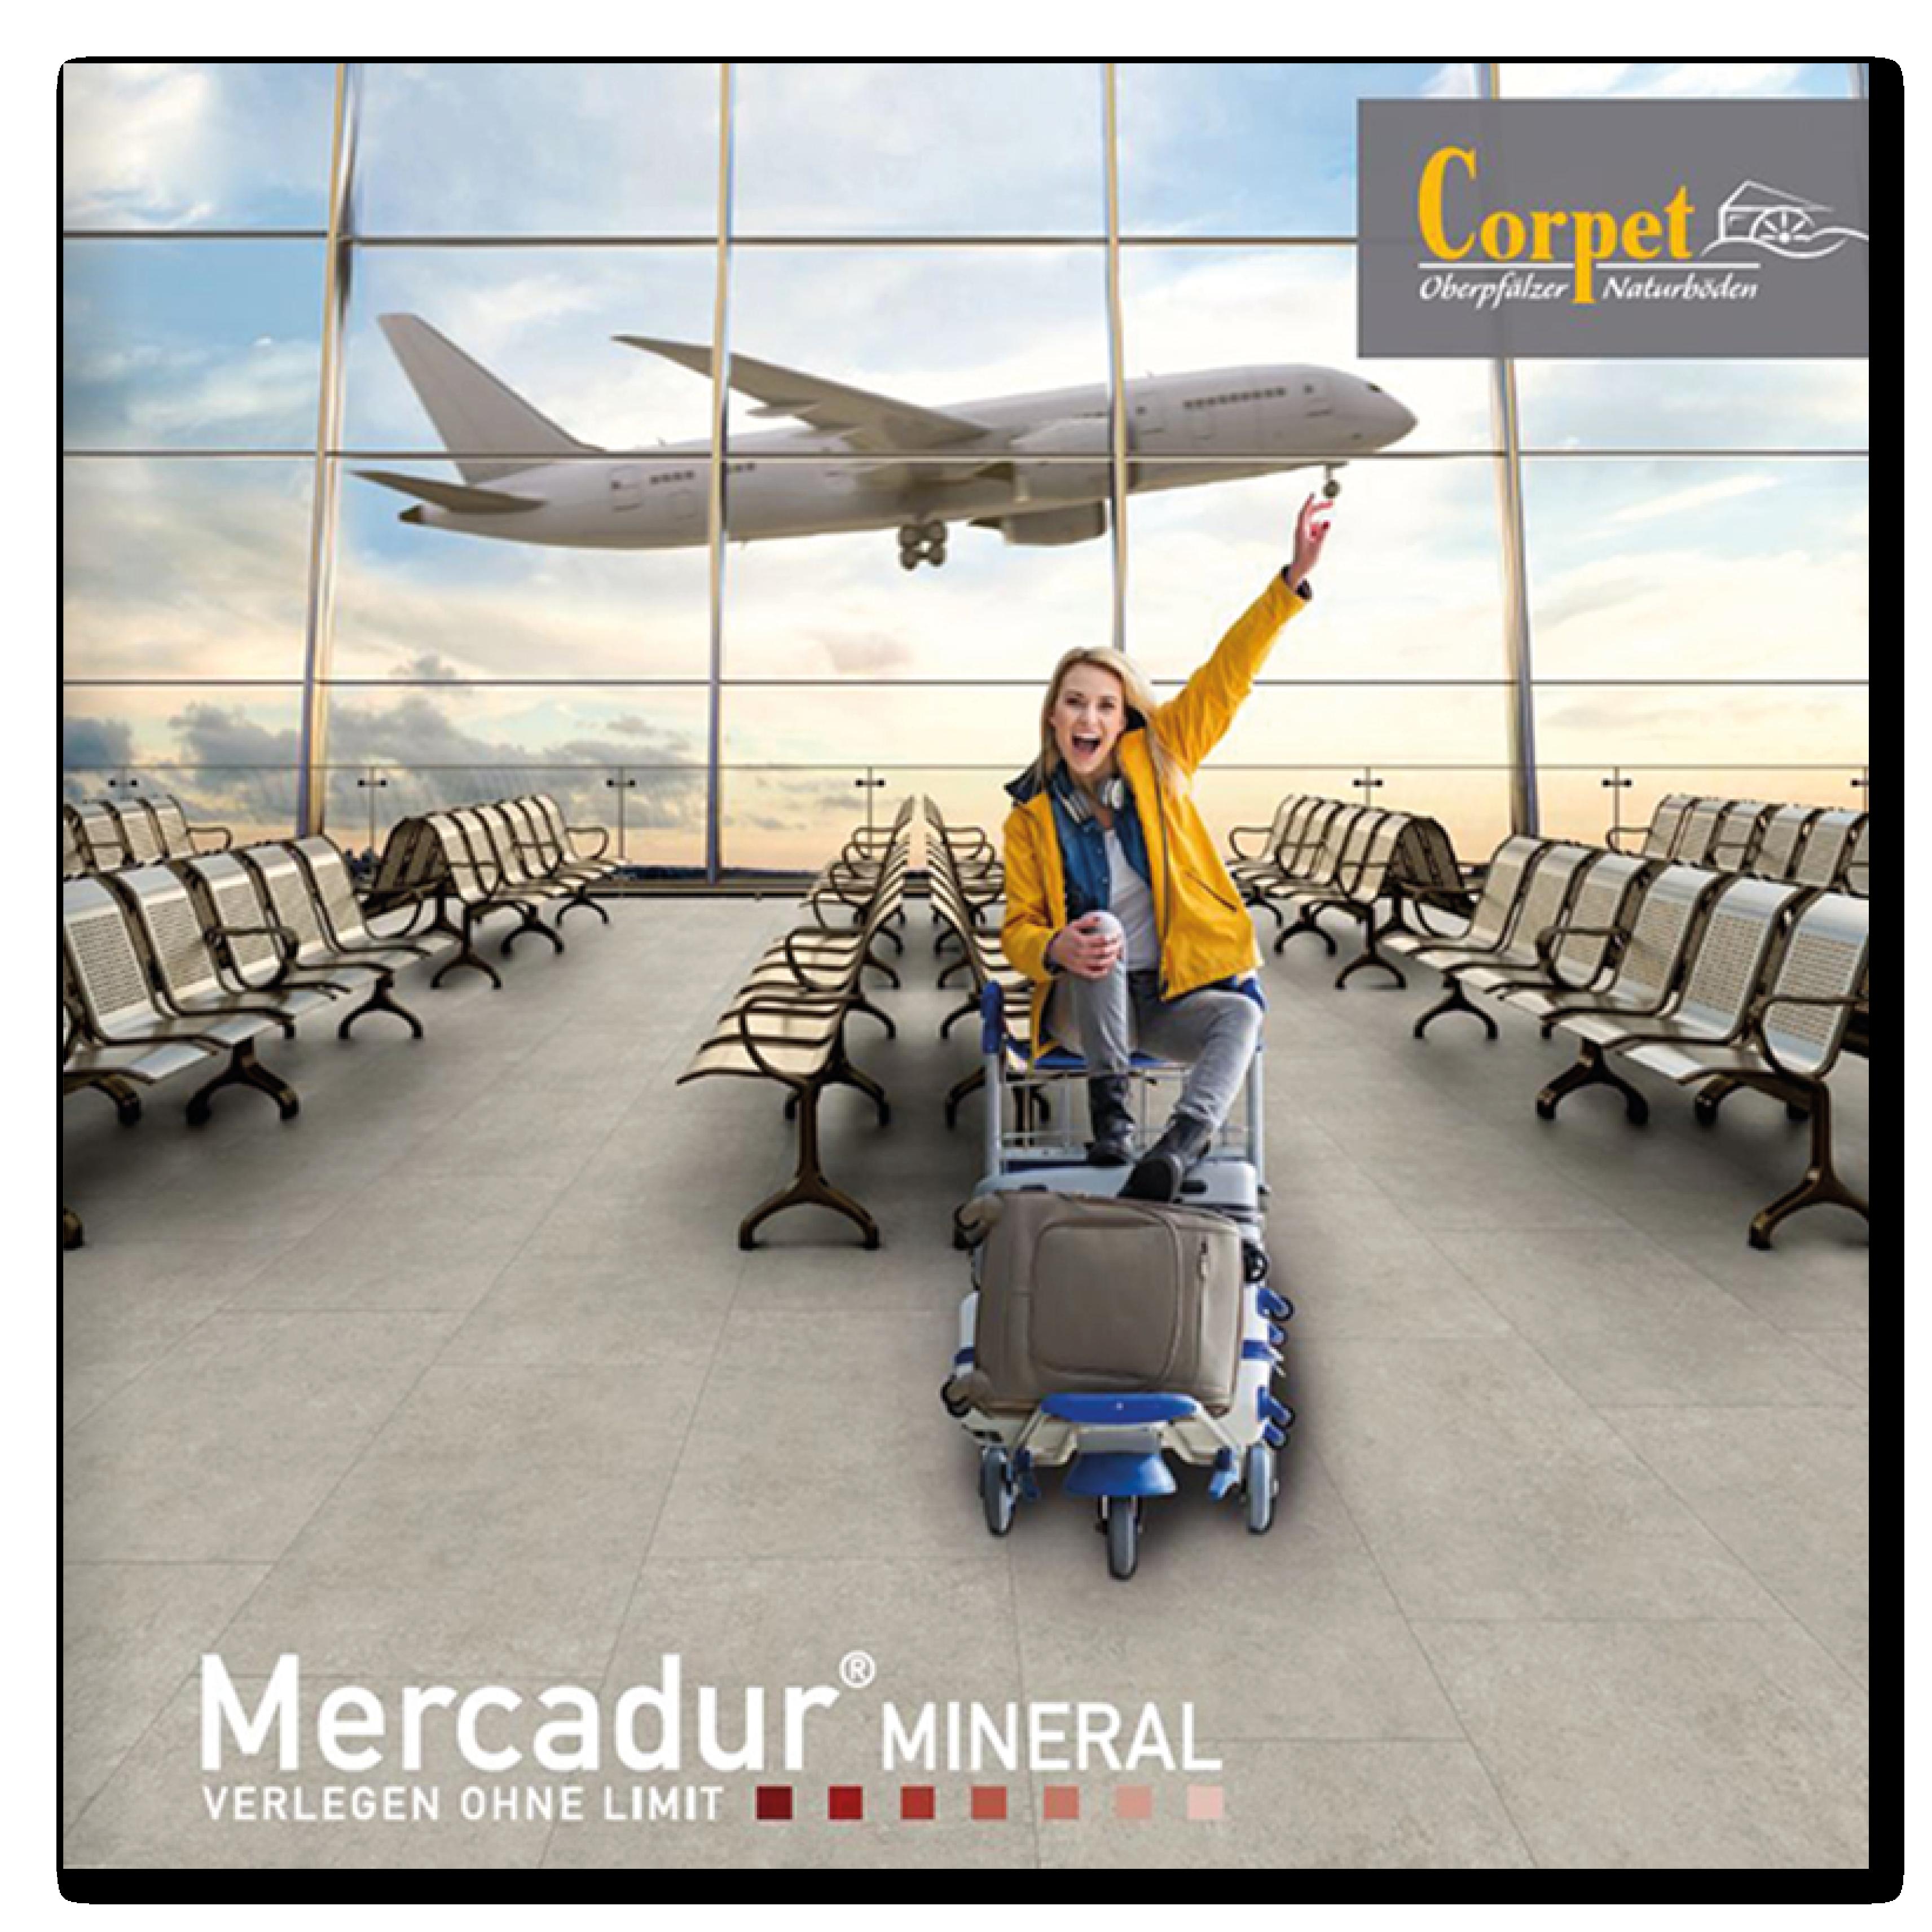 CC_Mercadur_Mineral_Katalog